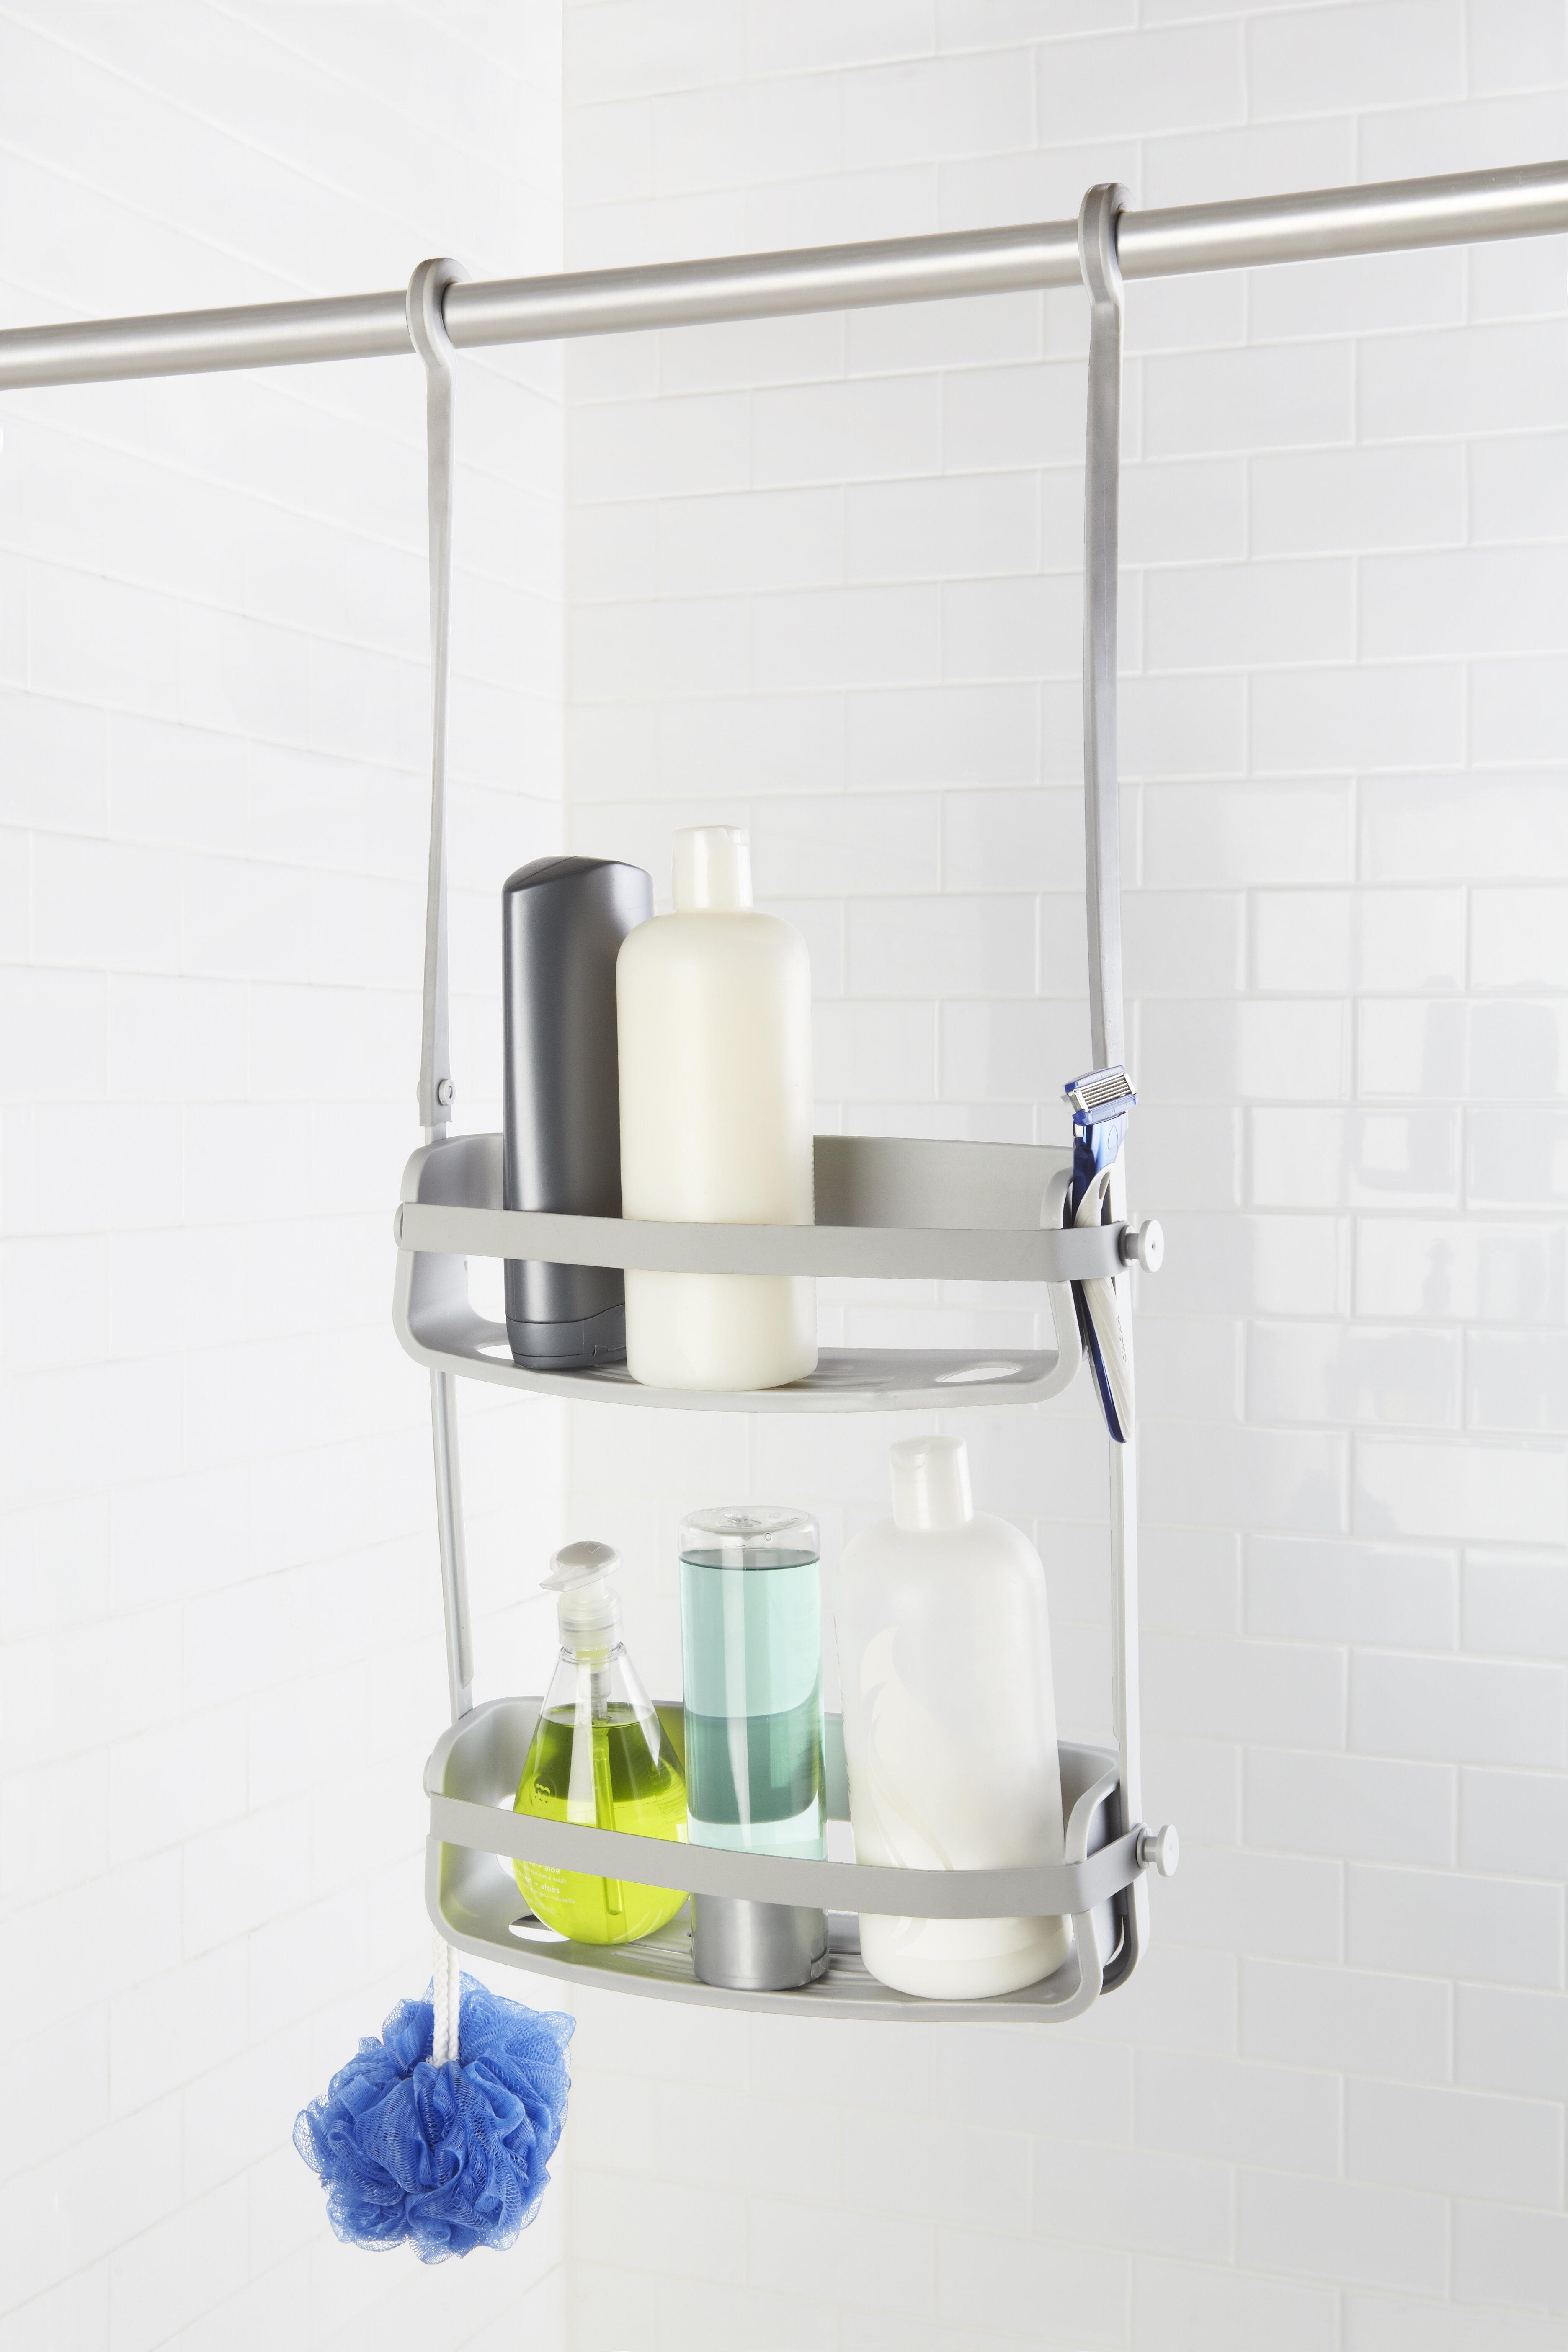 Shower Shampoo Holders You Ll Love In 2019 Wayfair